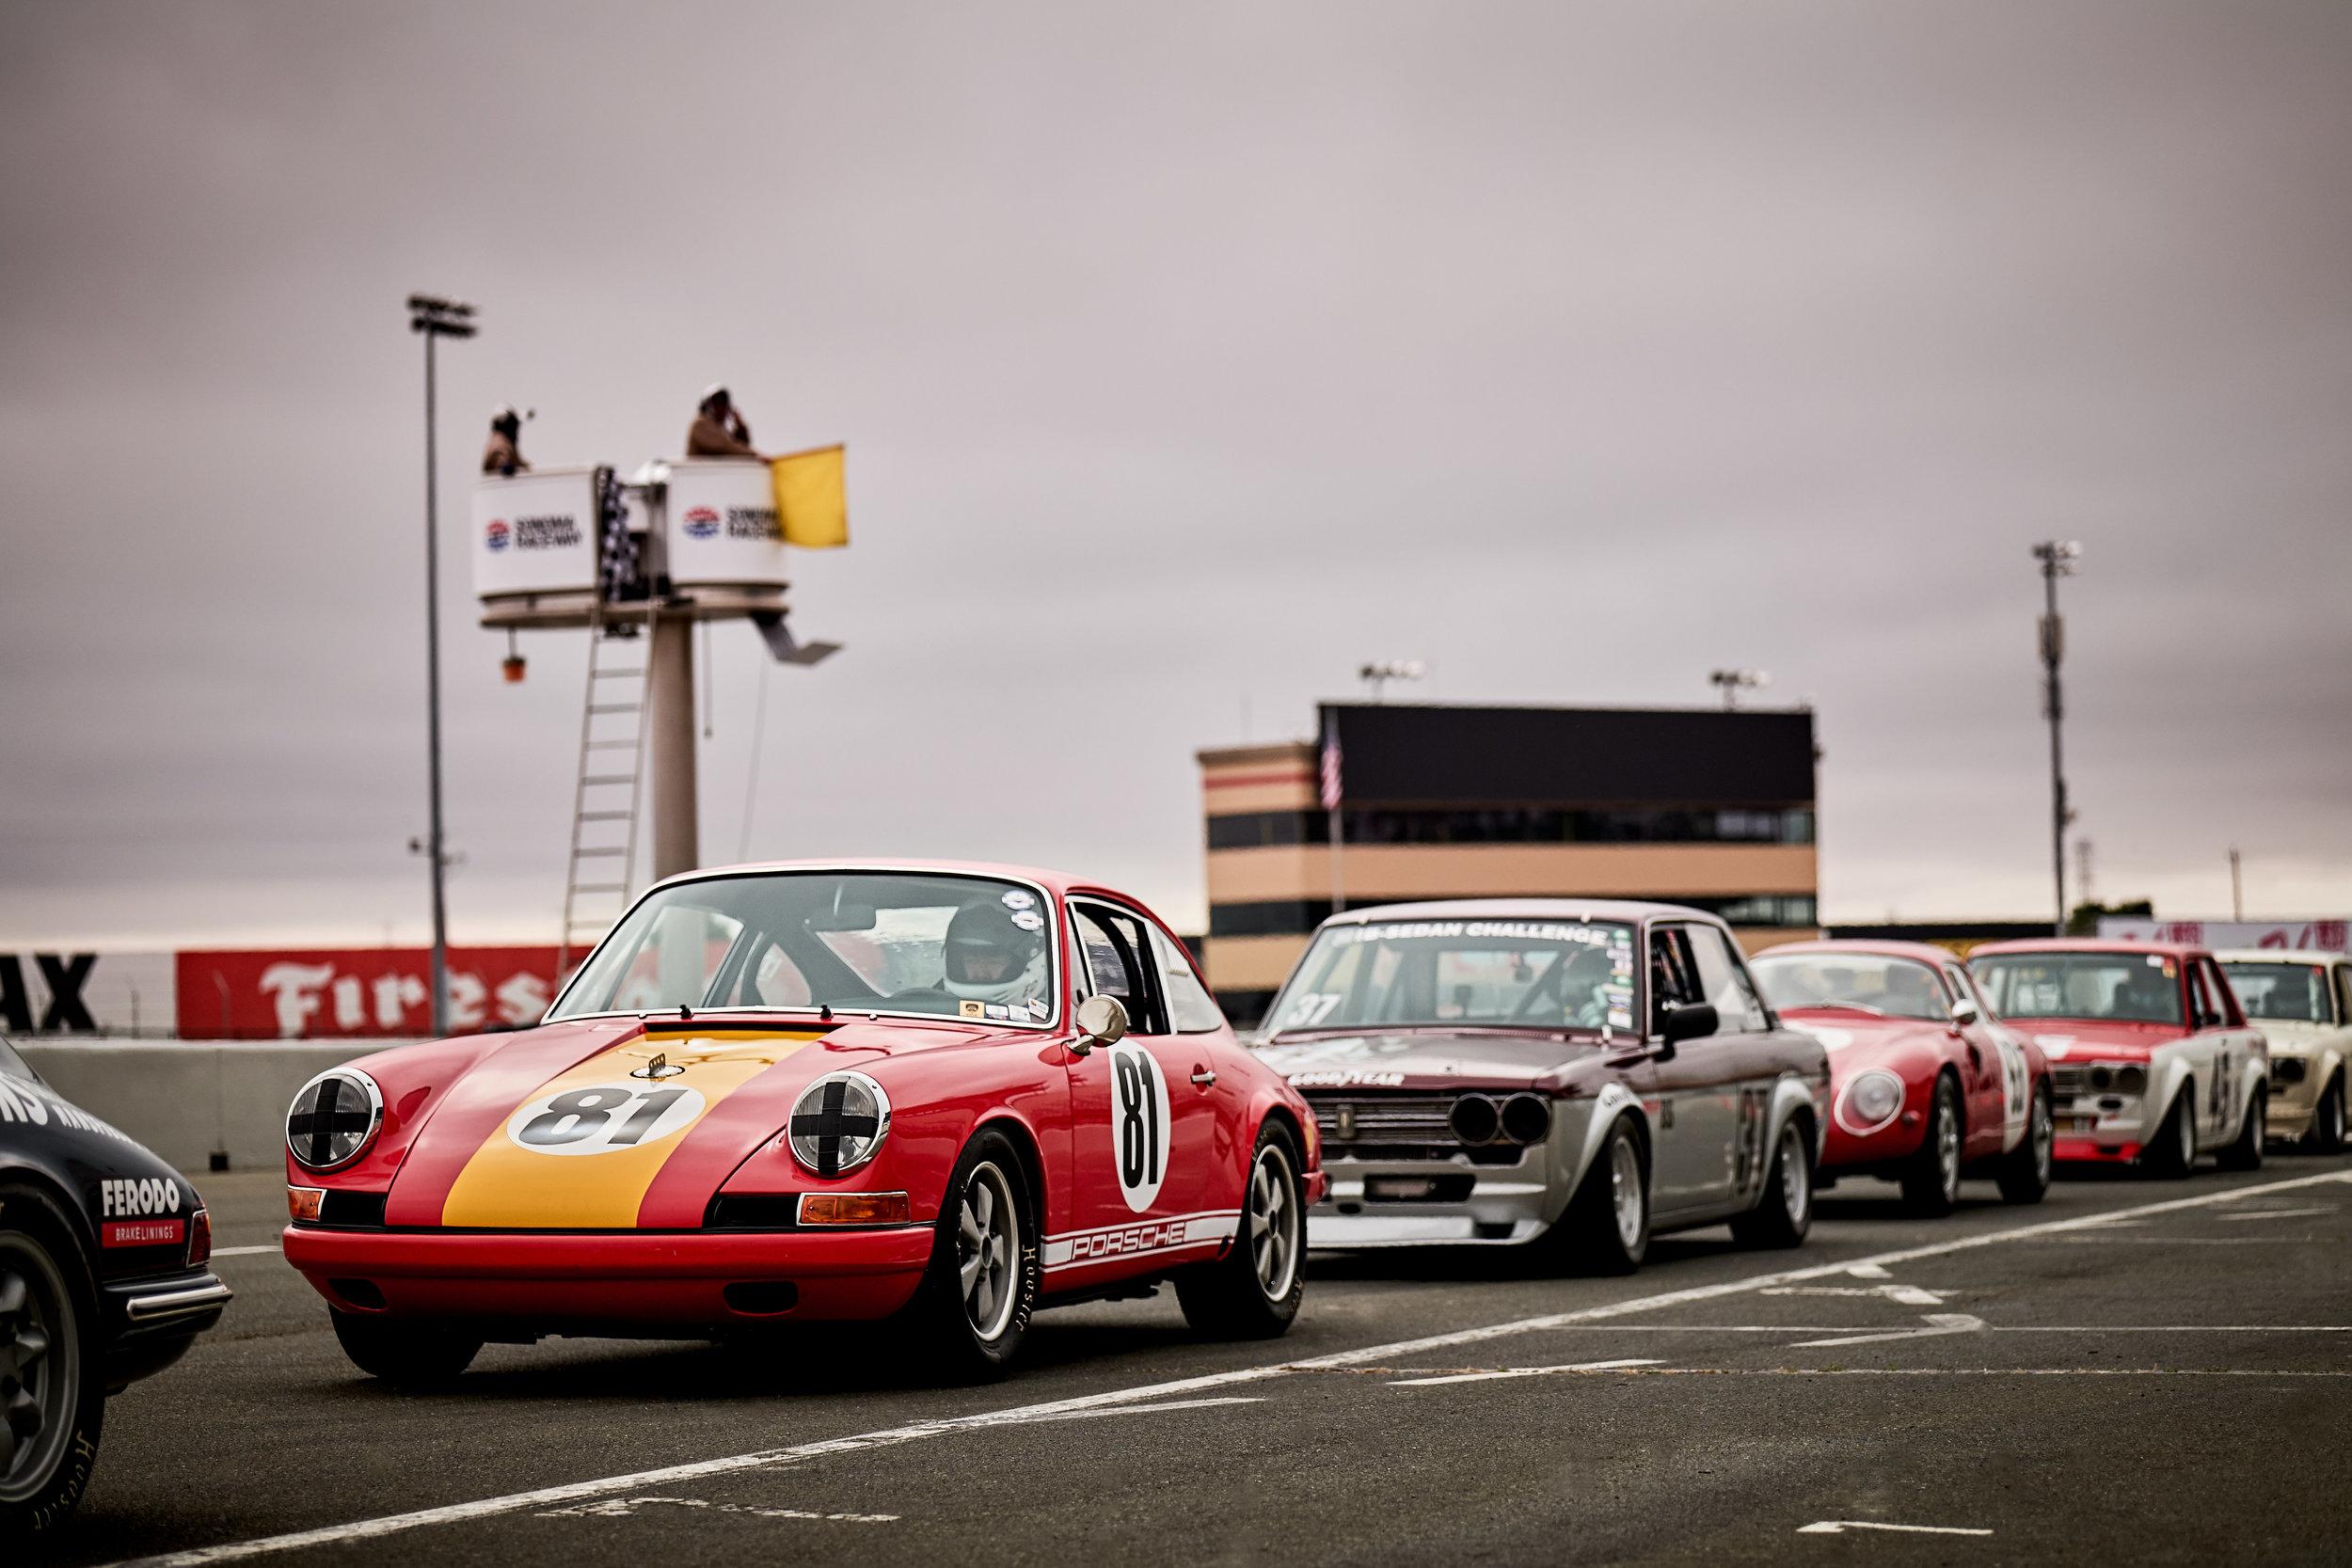 Porsche (exact make/model unknown) #81  1969 Datsun 510 / Mark Nettesheim (#137)